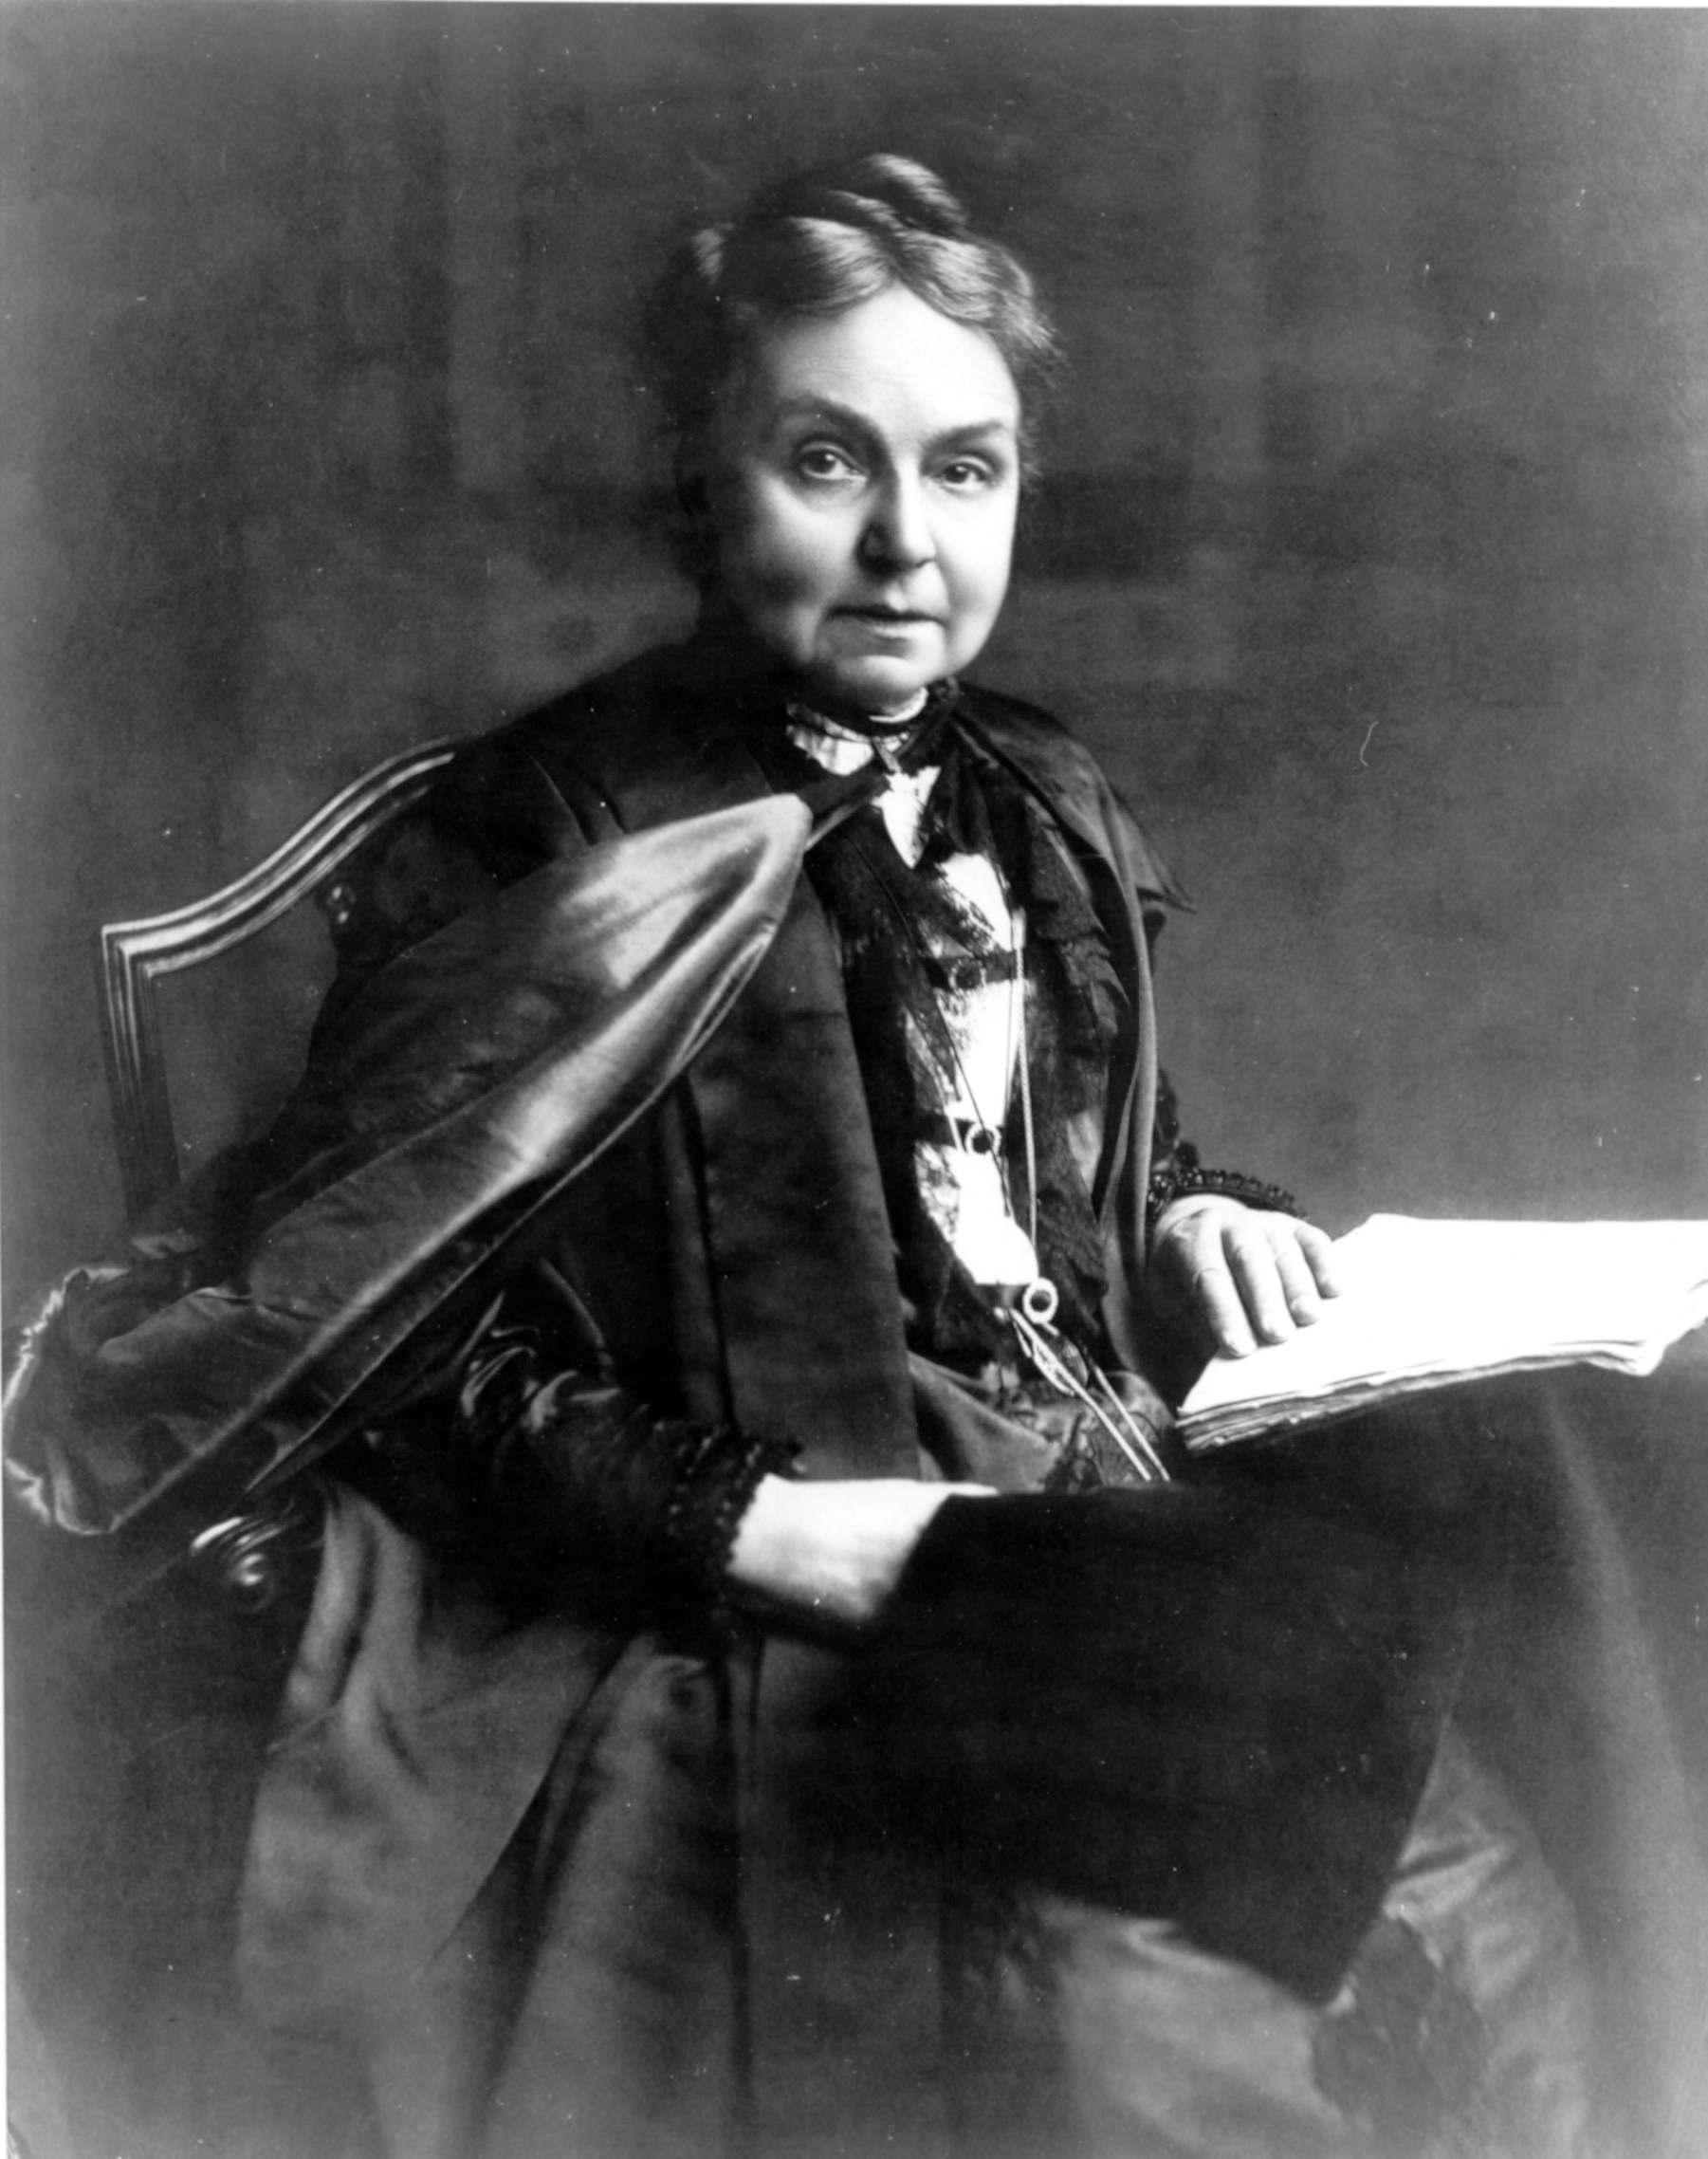 https://upload.wikimedia.org/wikipedia/commons/c/cc/Janet_Anne_Galloway.jpg